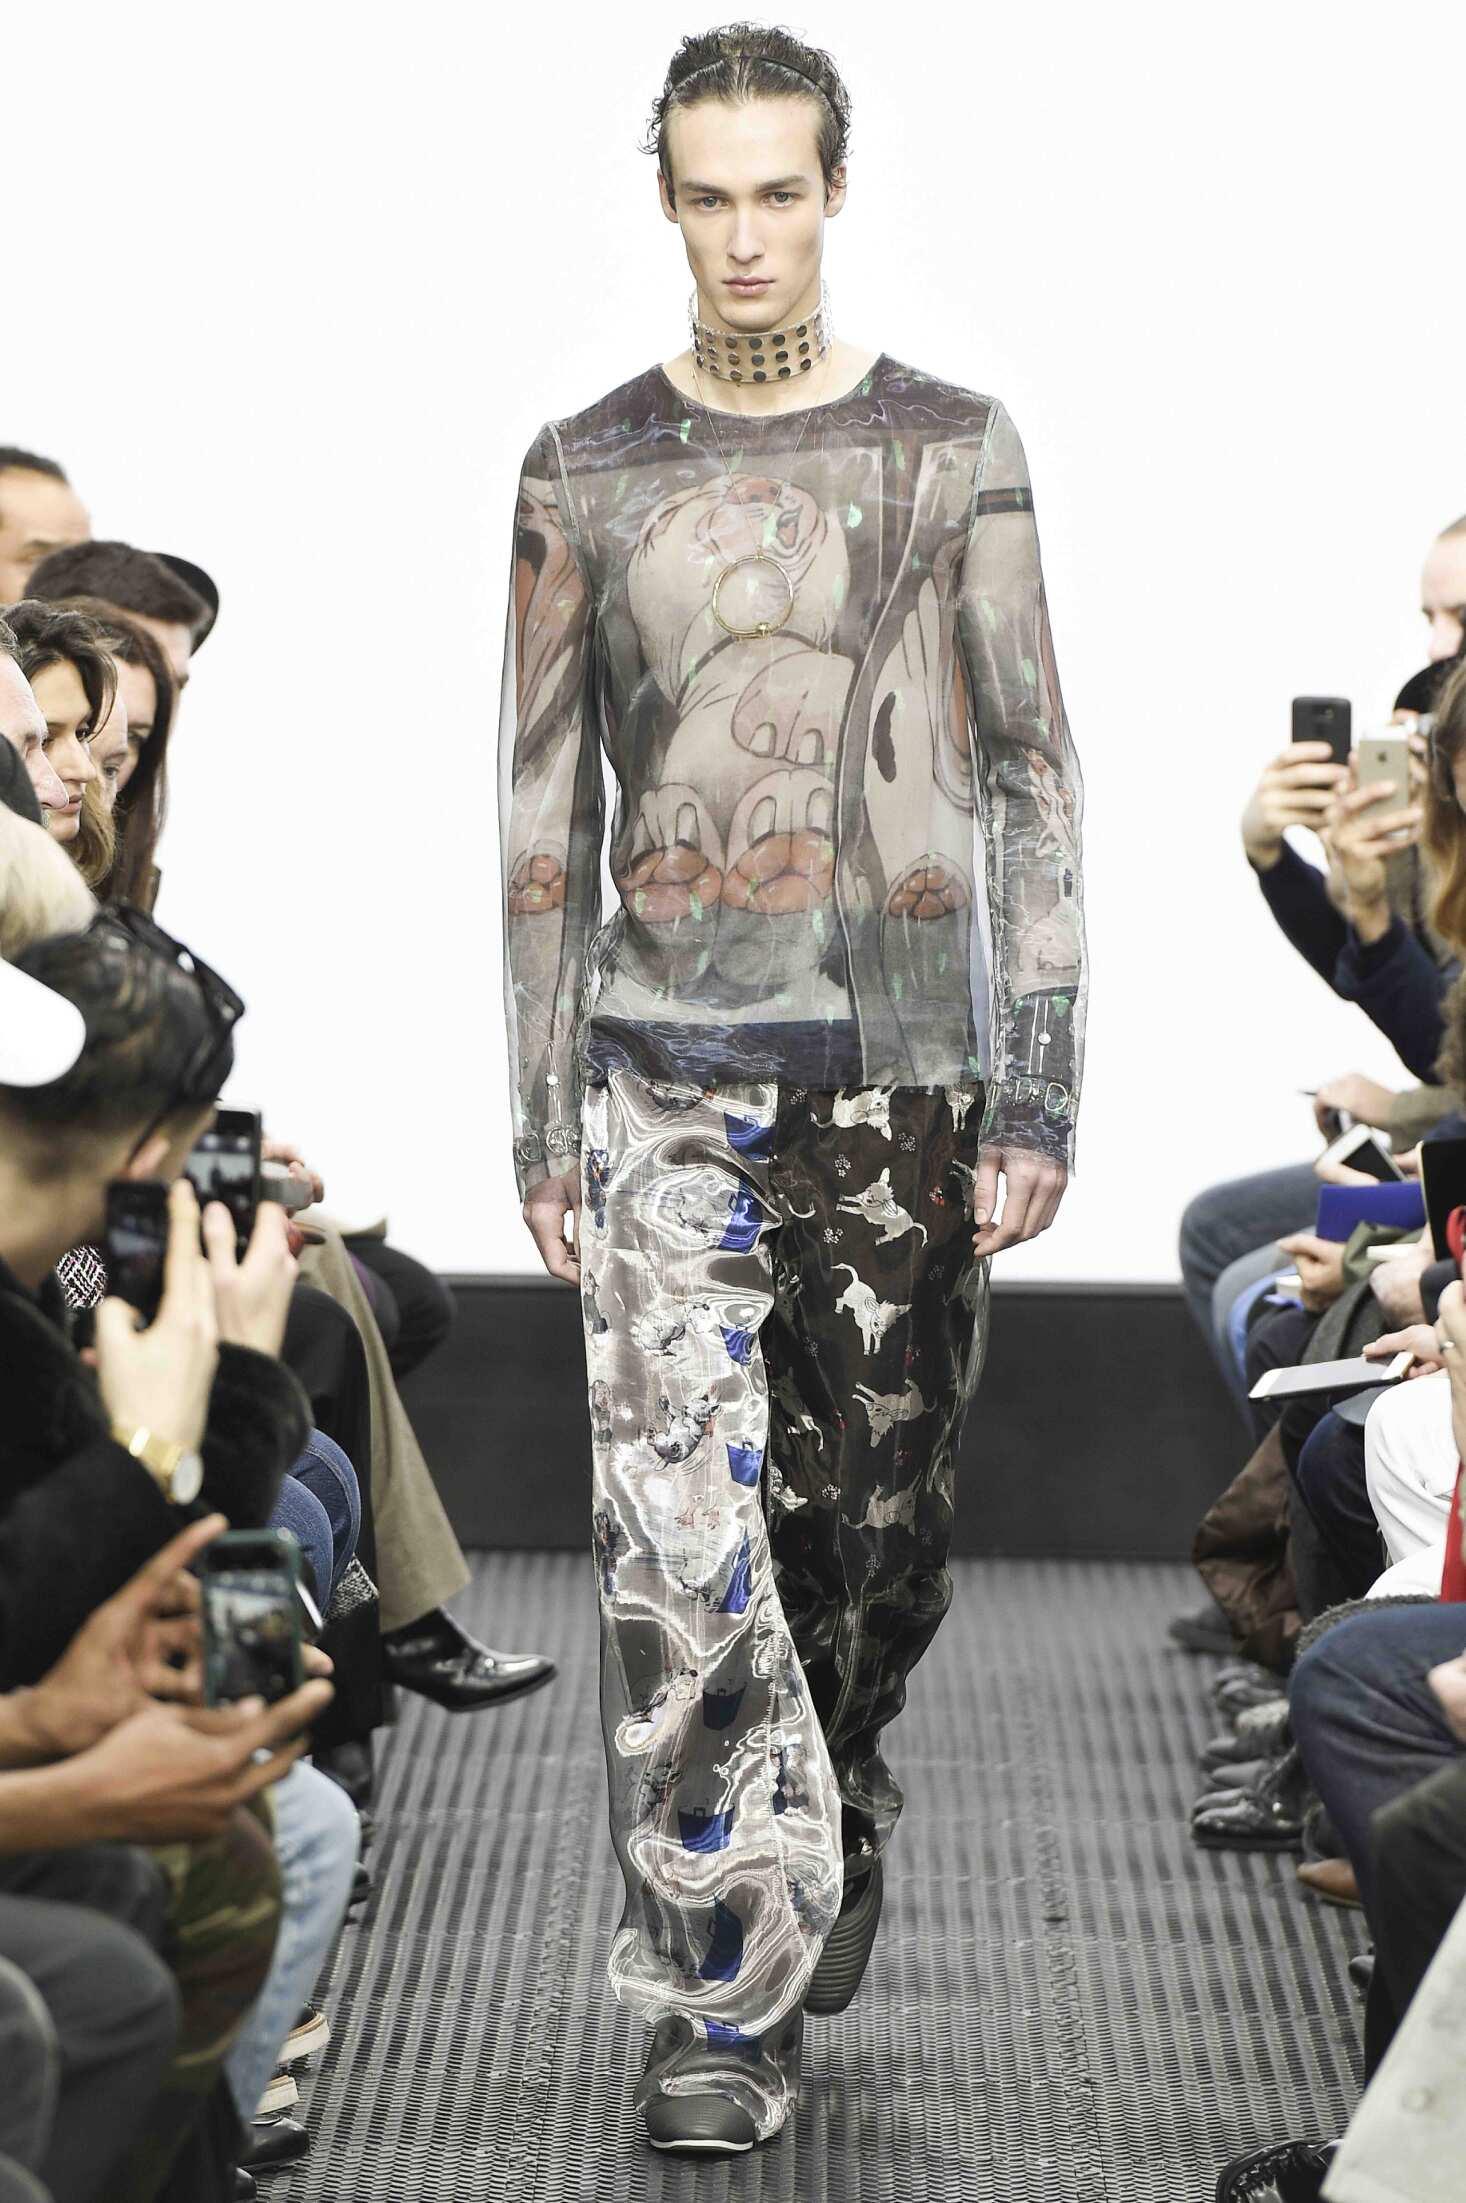 Runway J.W. Anderson Fall Winter 2016 Men's Collection London Fashion Week